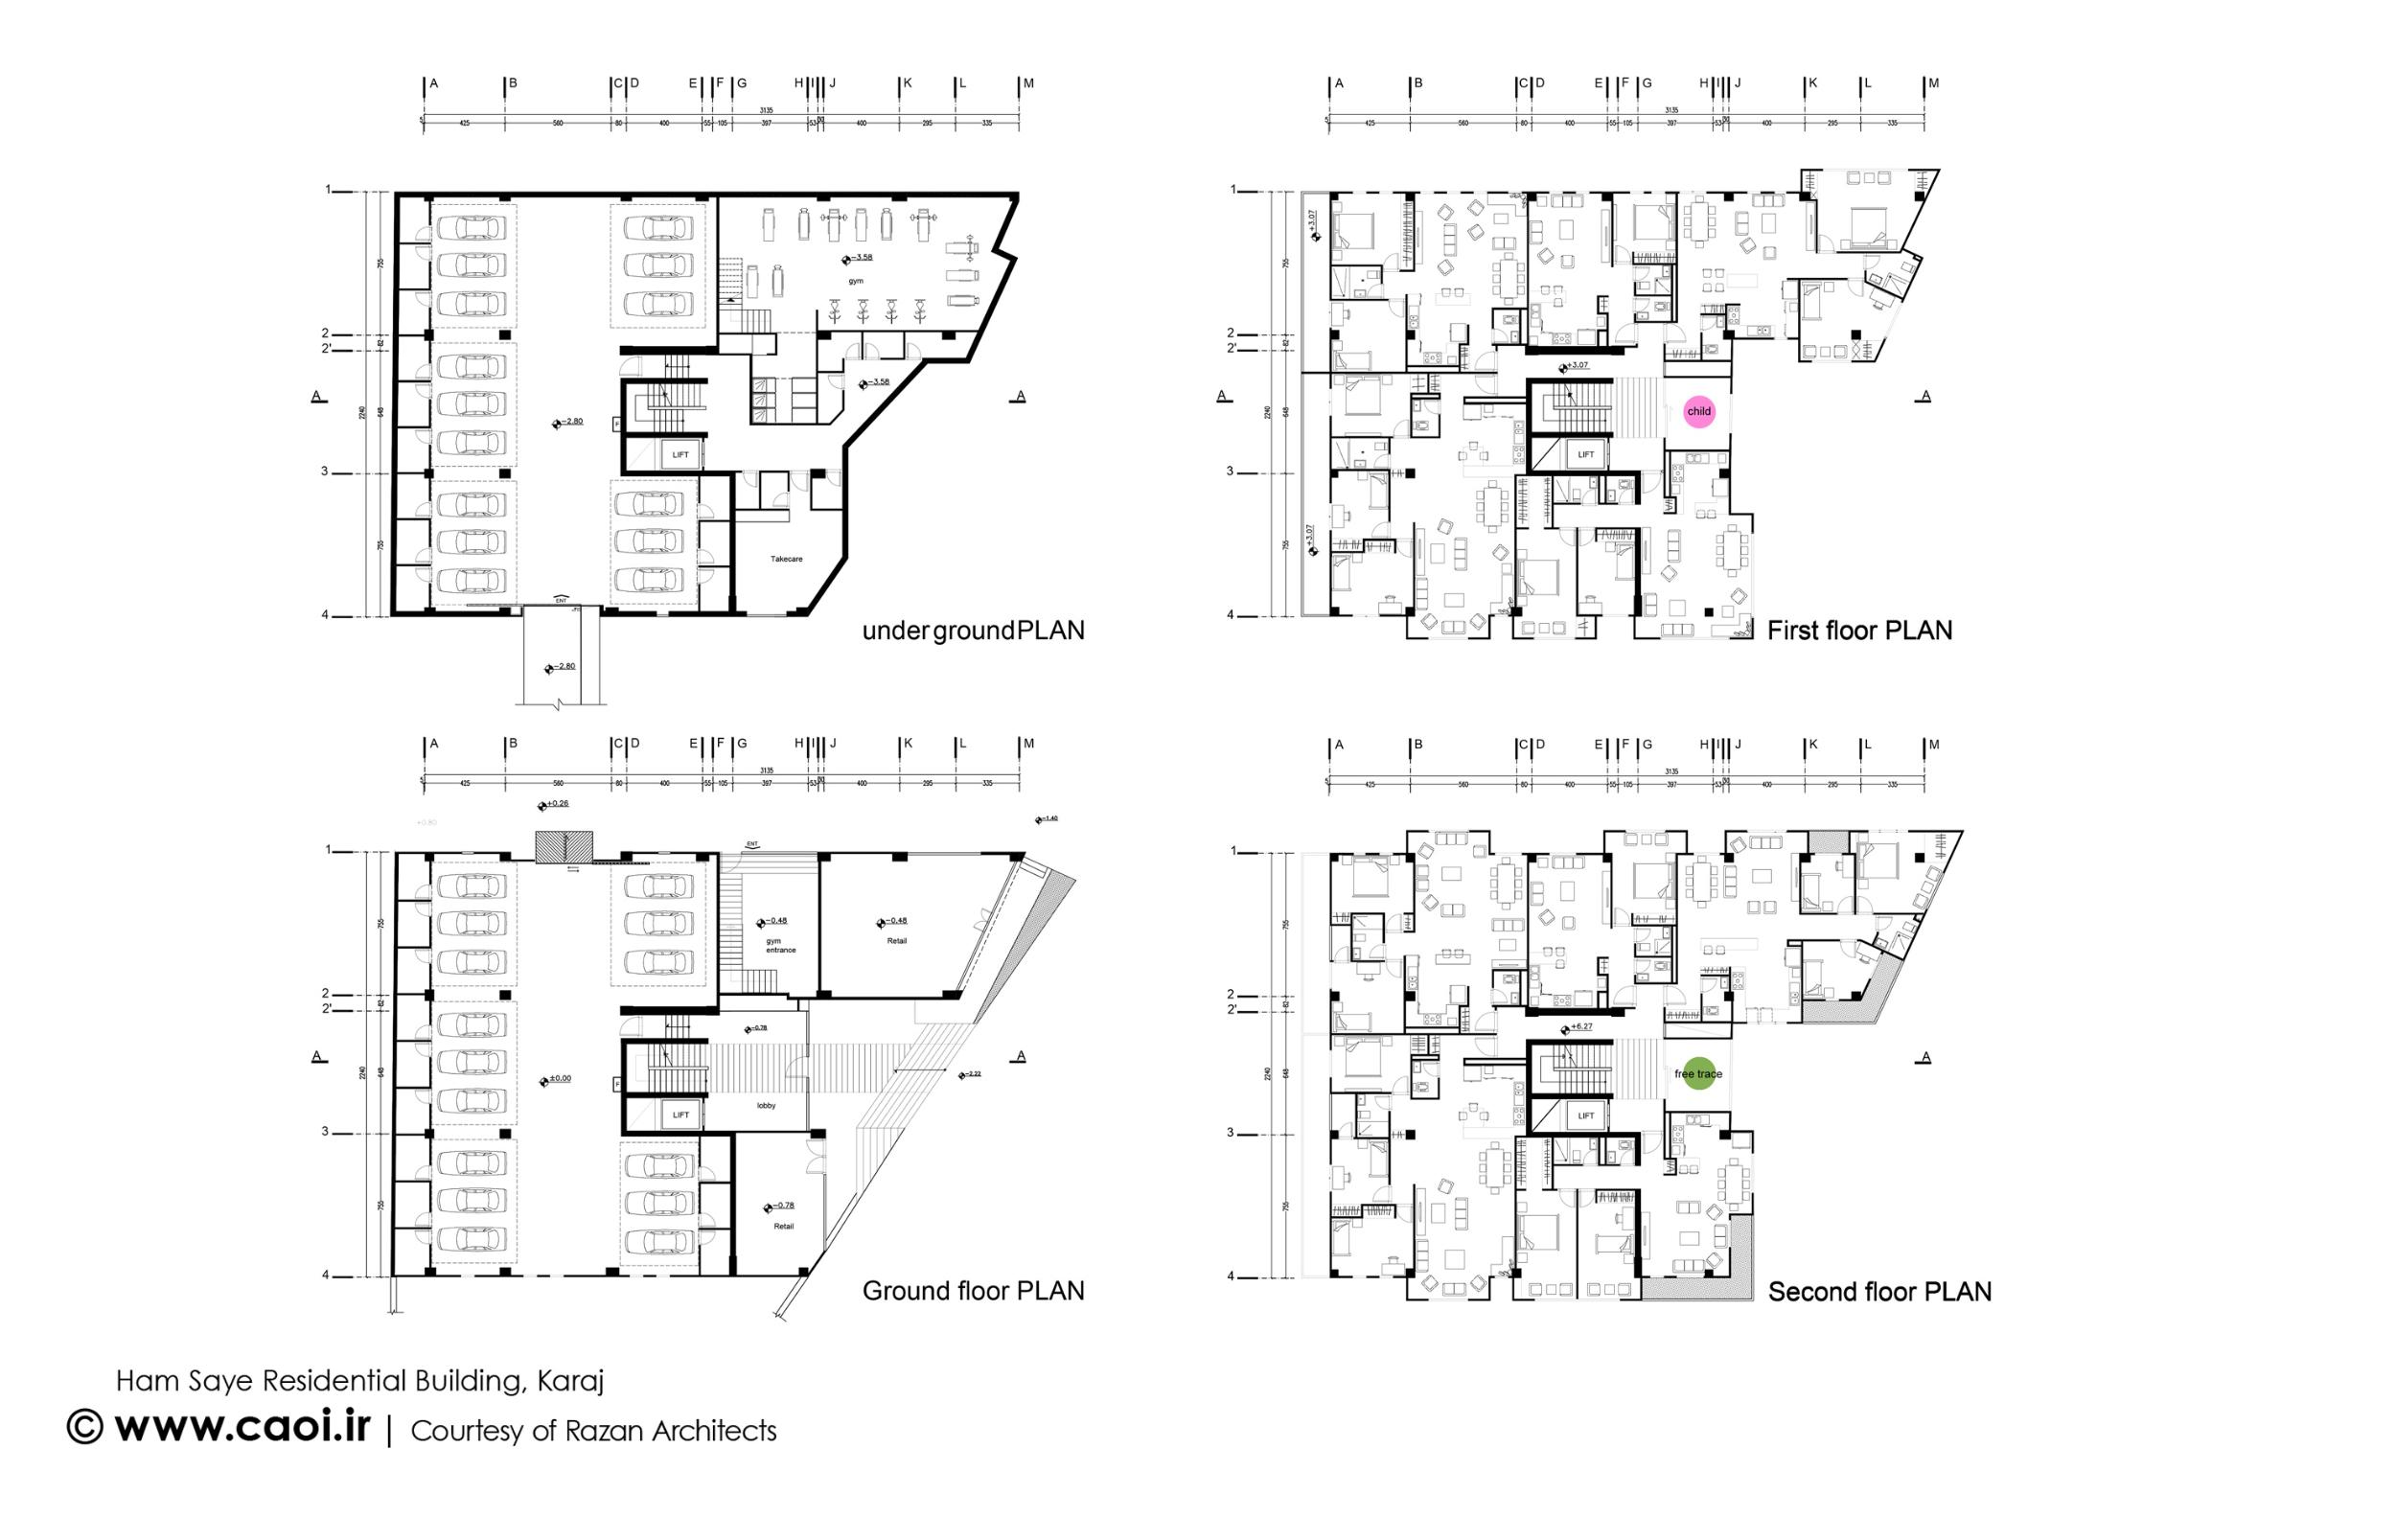 پلان مجتمع مسکونی,نقشه مجتمع مسکونی,نقشه ساختمان مسکونی